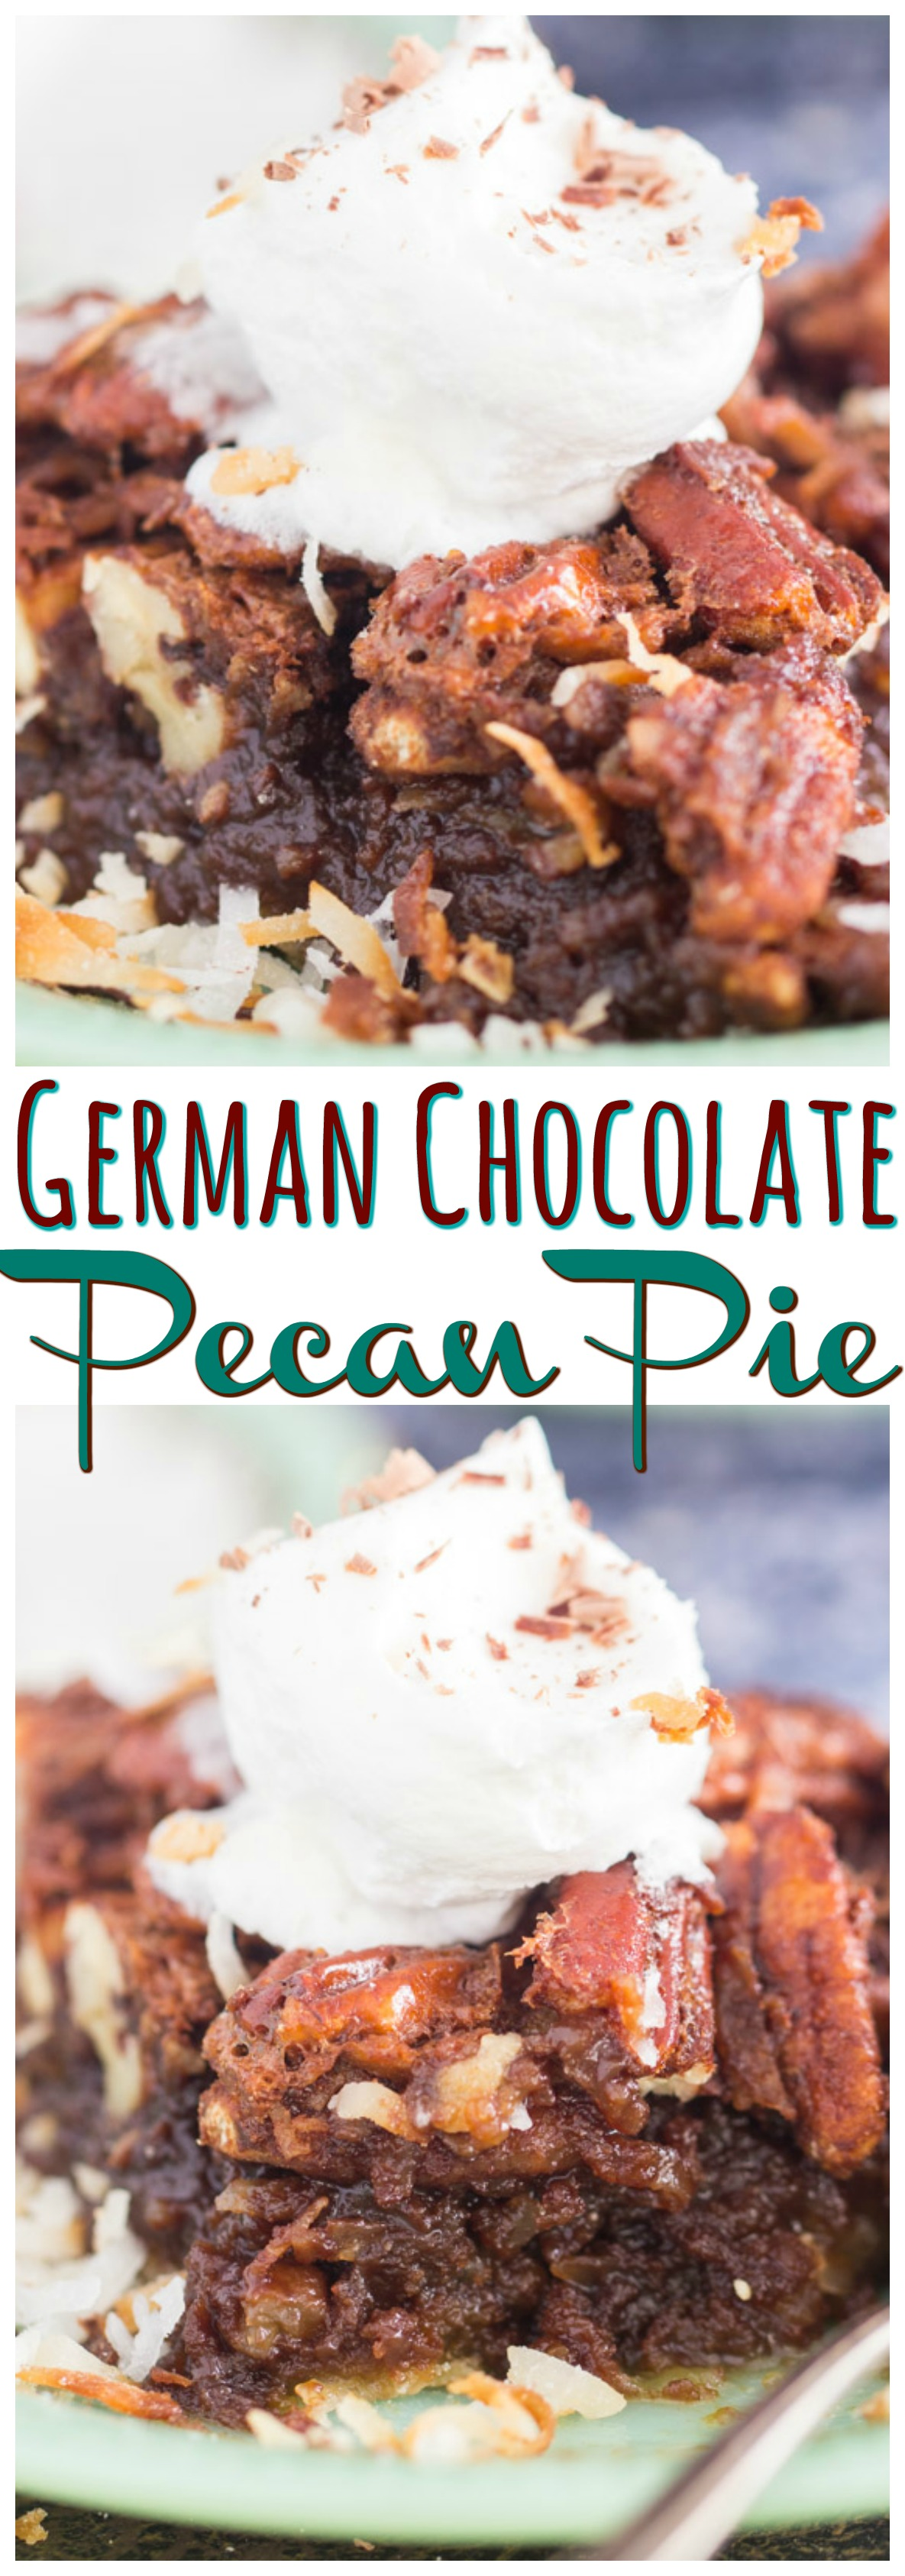 German Chocolate Pecan Pie The Gold Lining Girl